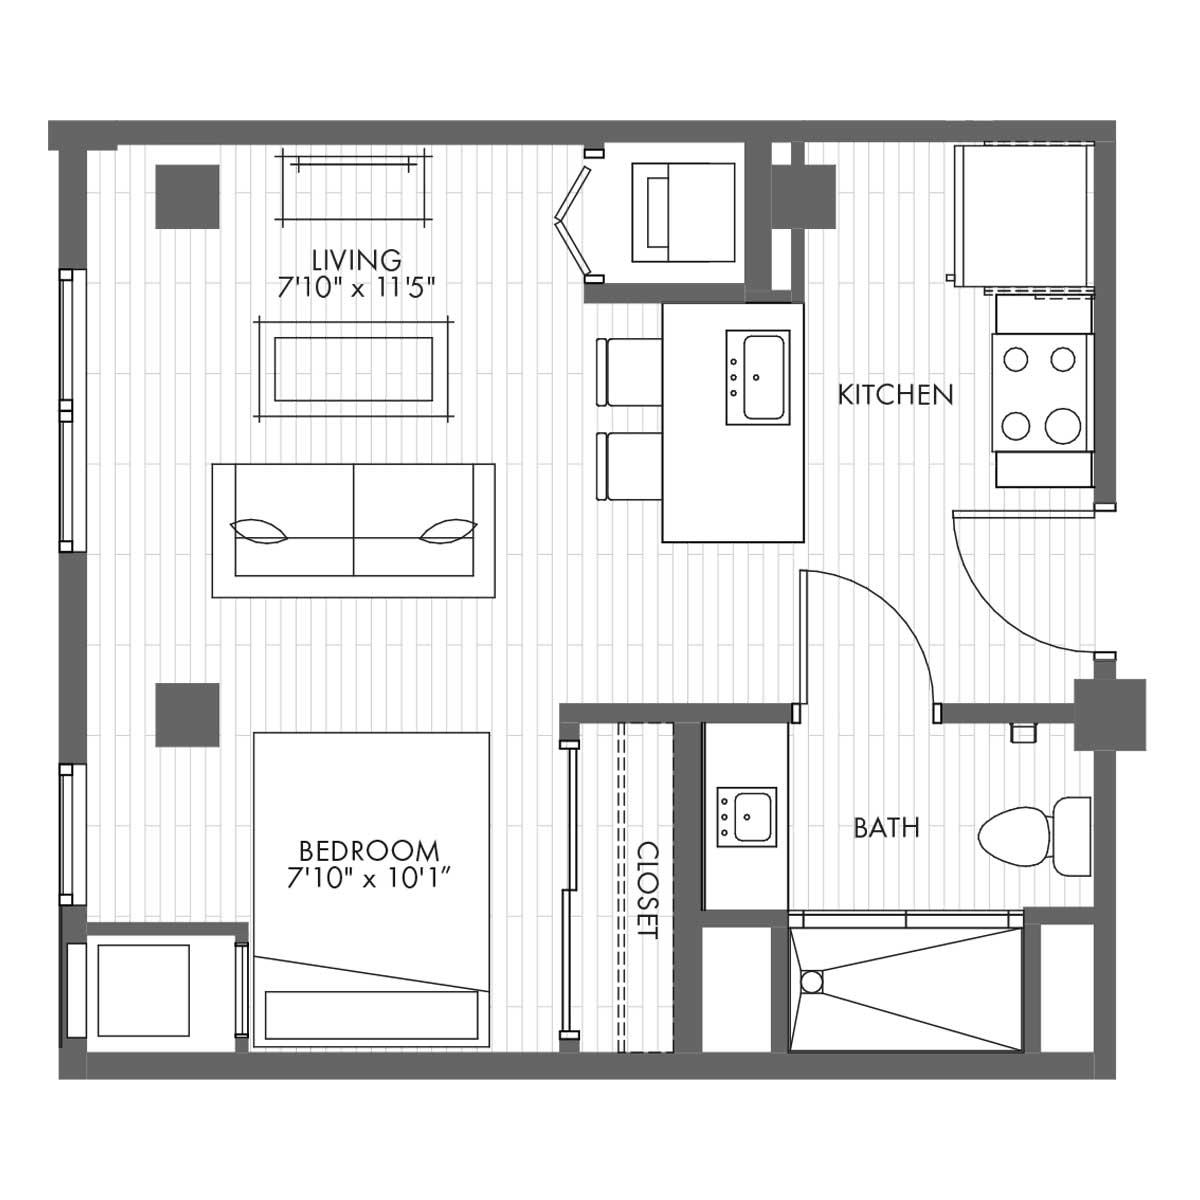 Studio Apartment Home - Style 0B